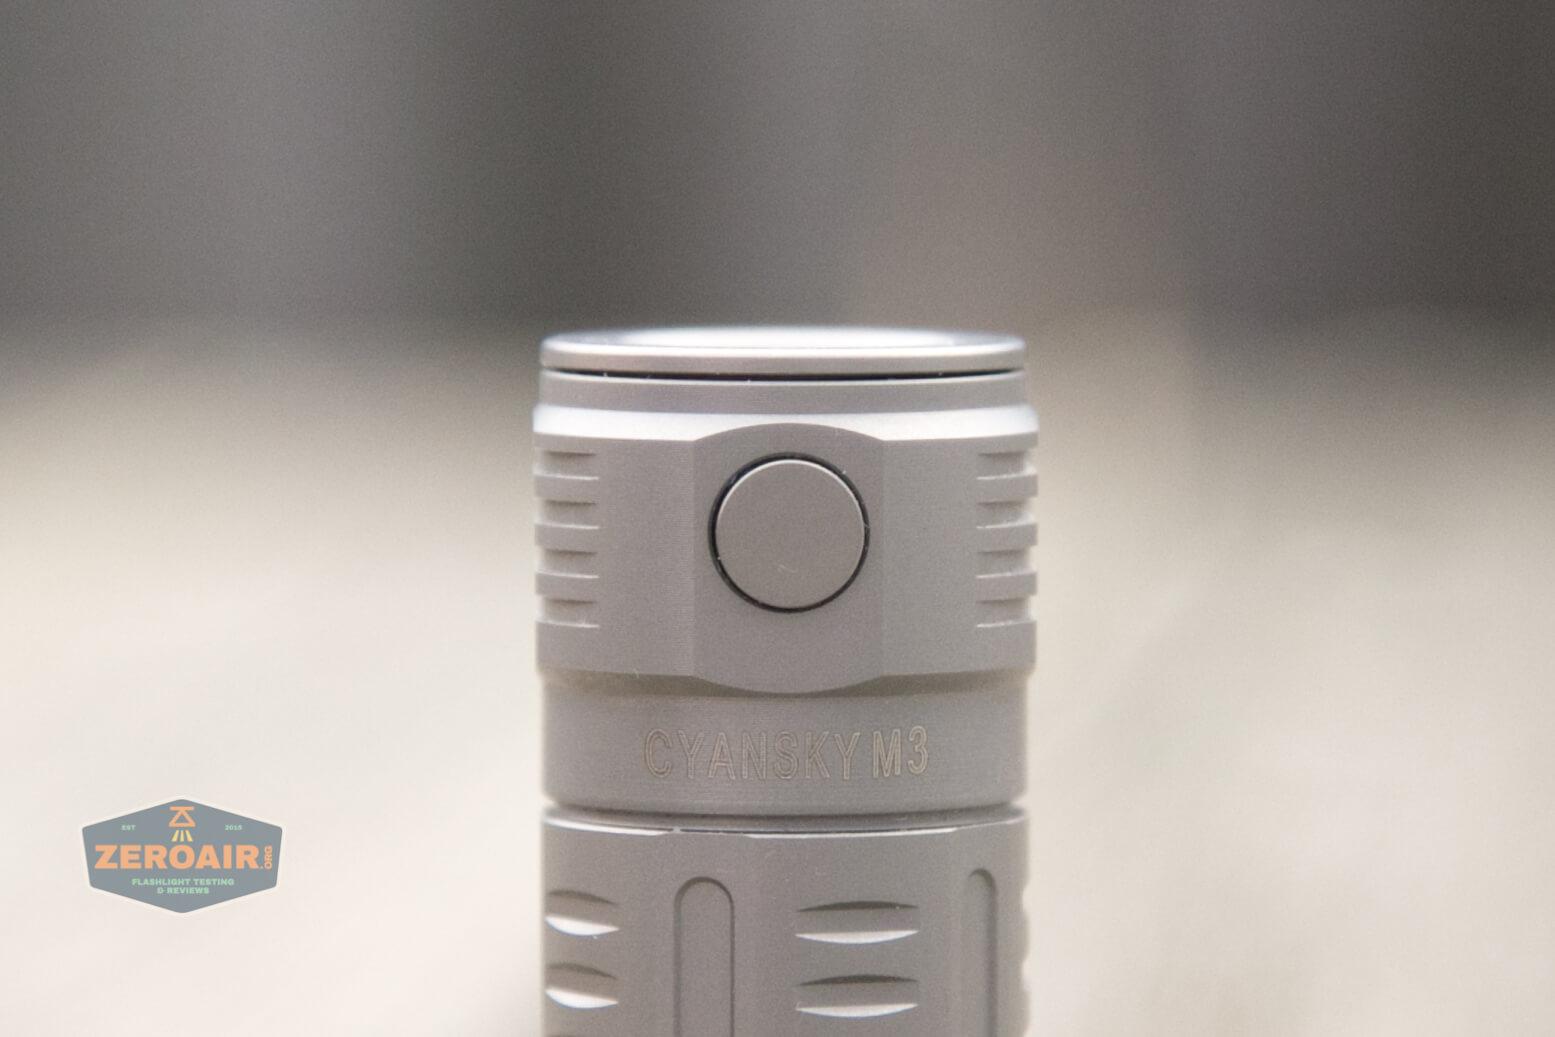 freasygears cyansky m3 titanium pocket flashlight metal switch